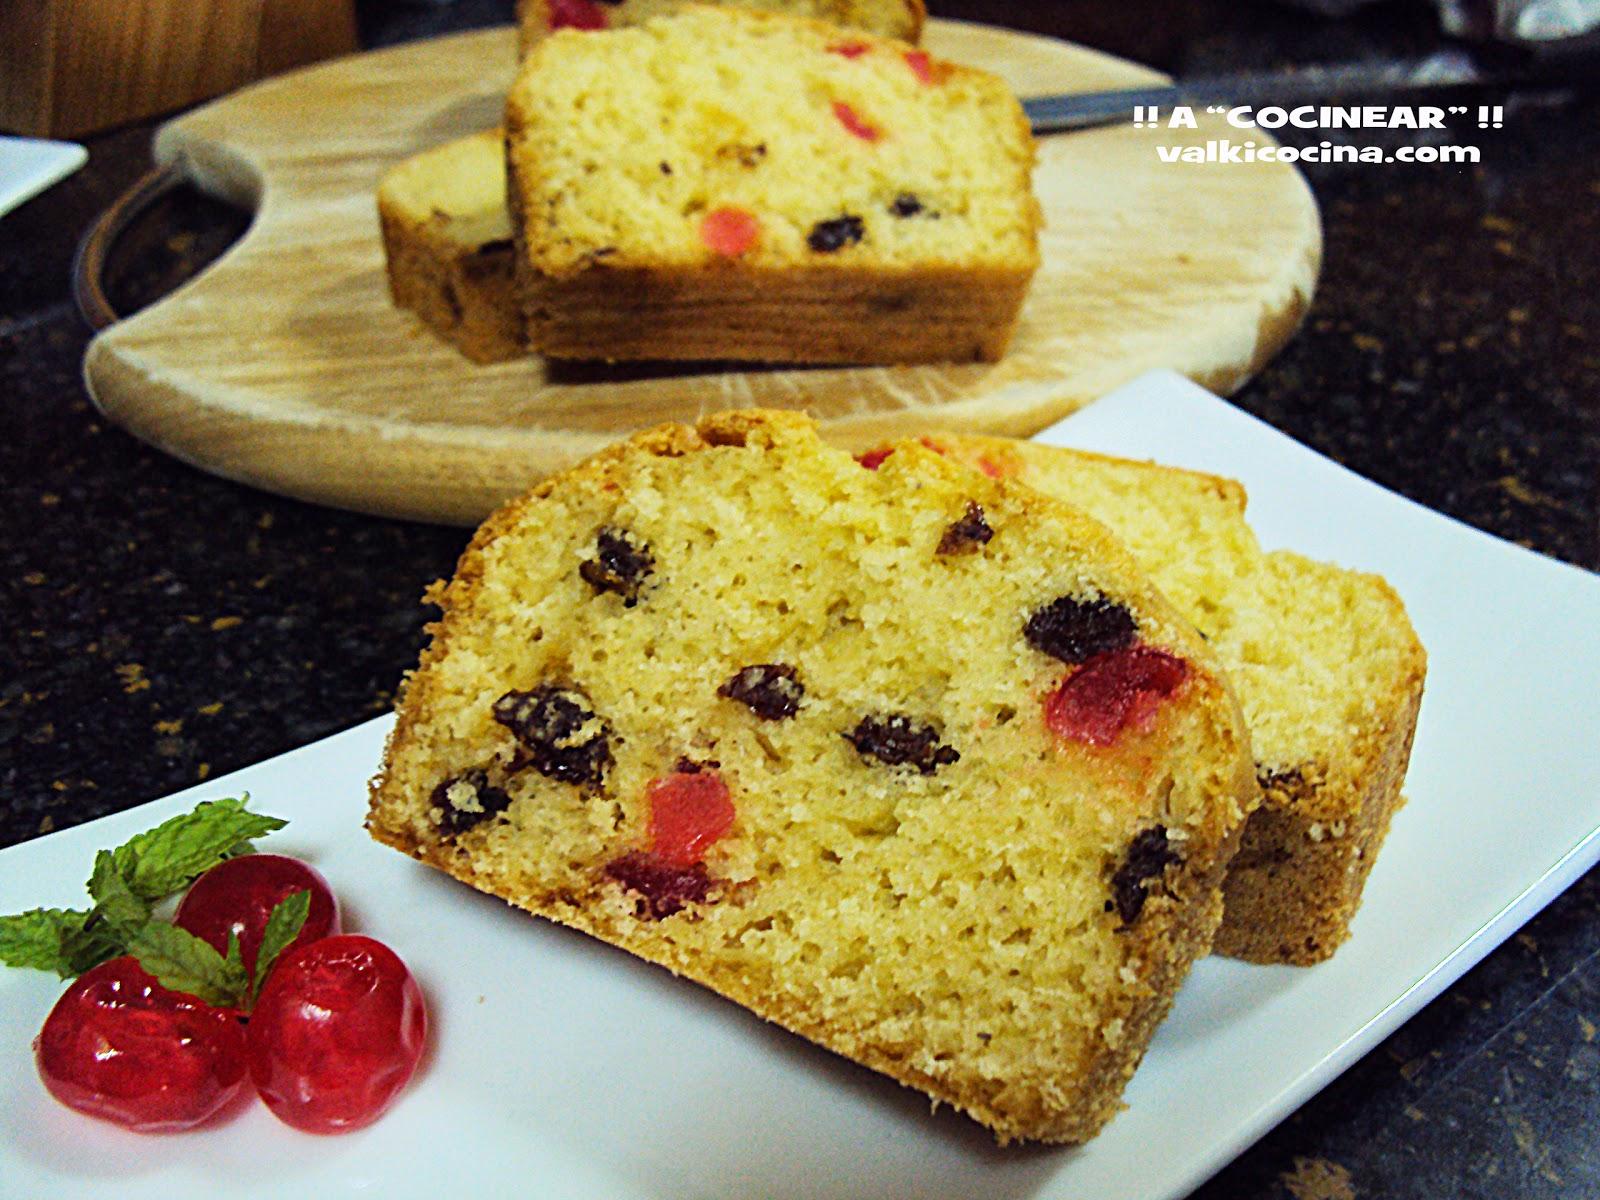 Plum cake de pasas y cerezas confitadas